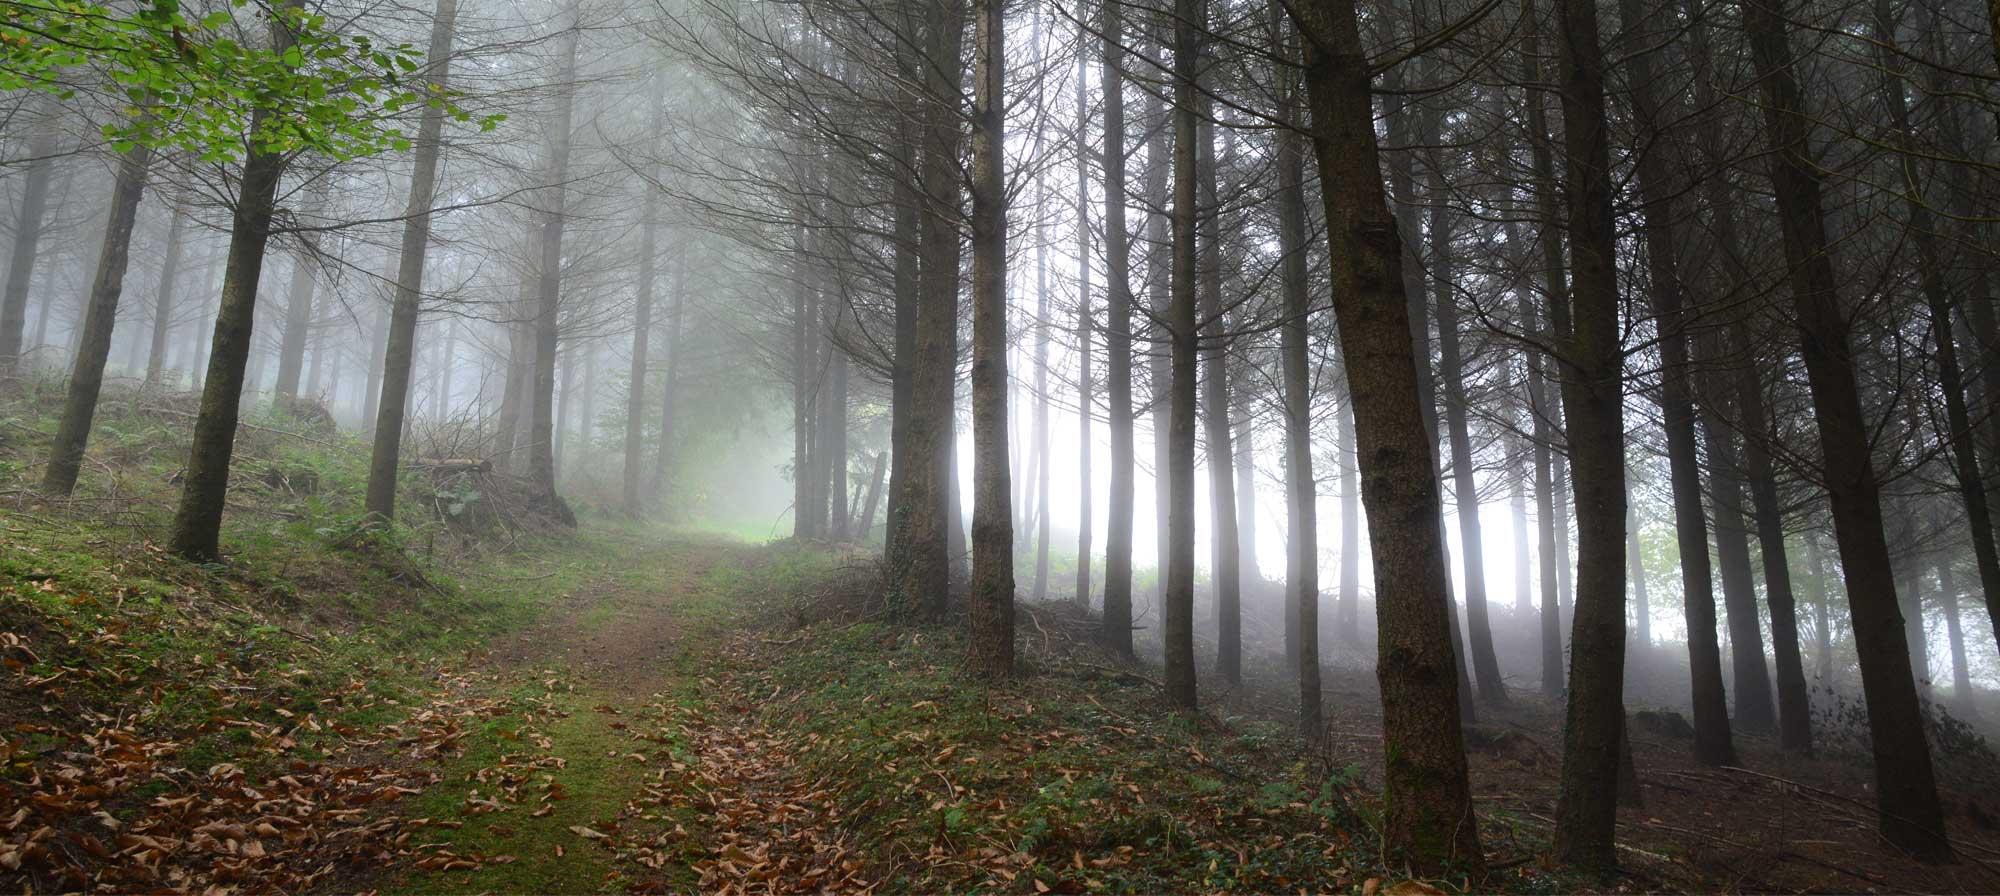 Propriétaire forestier